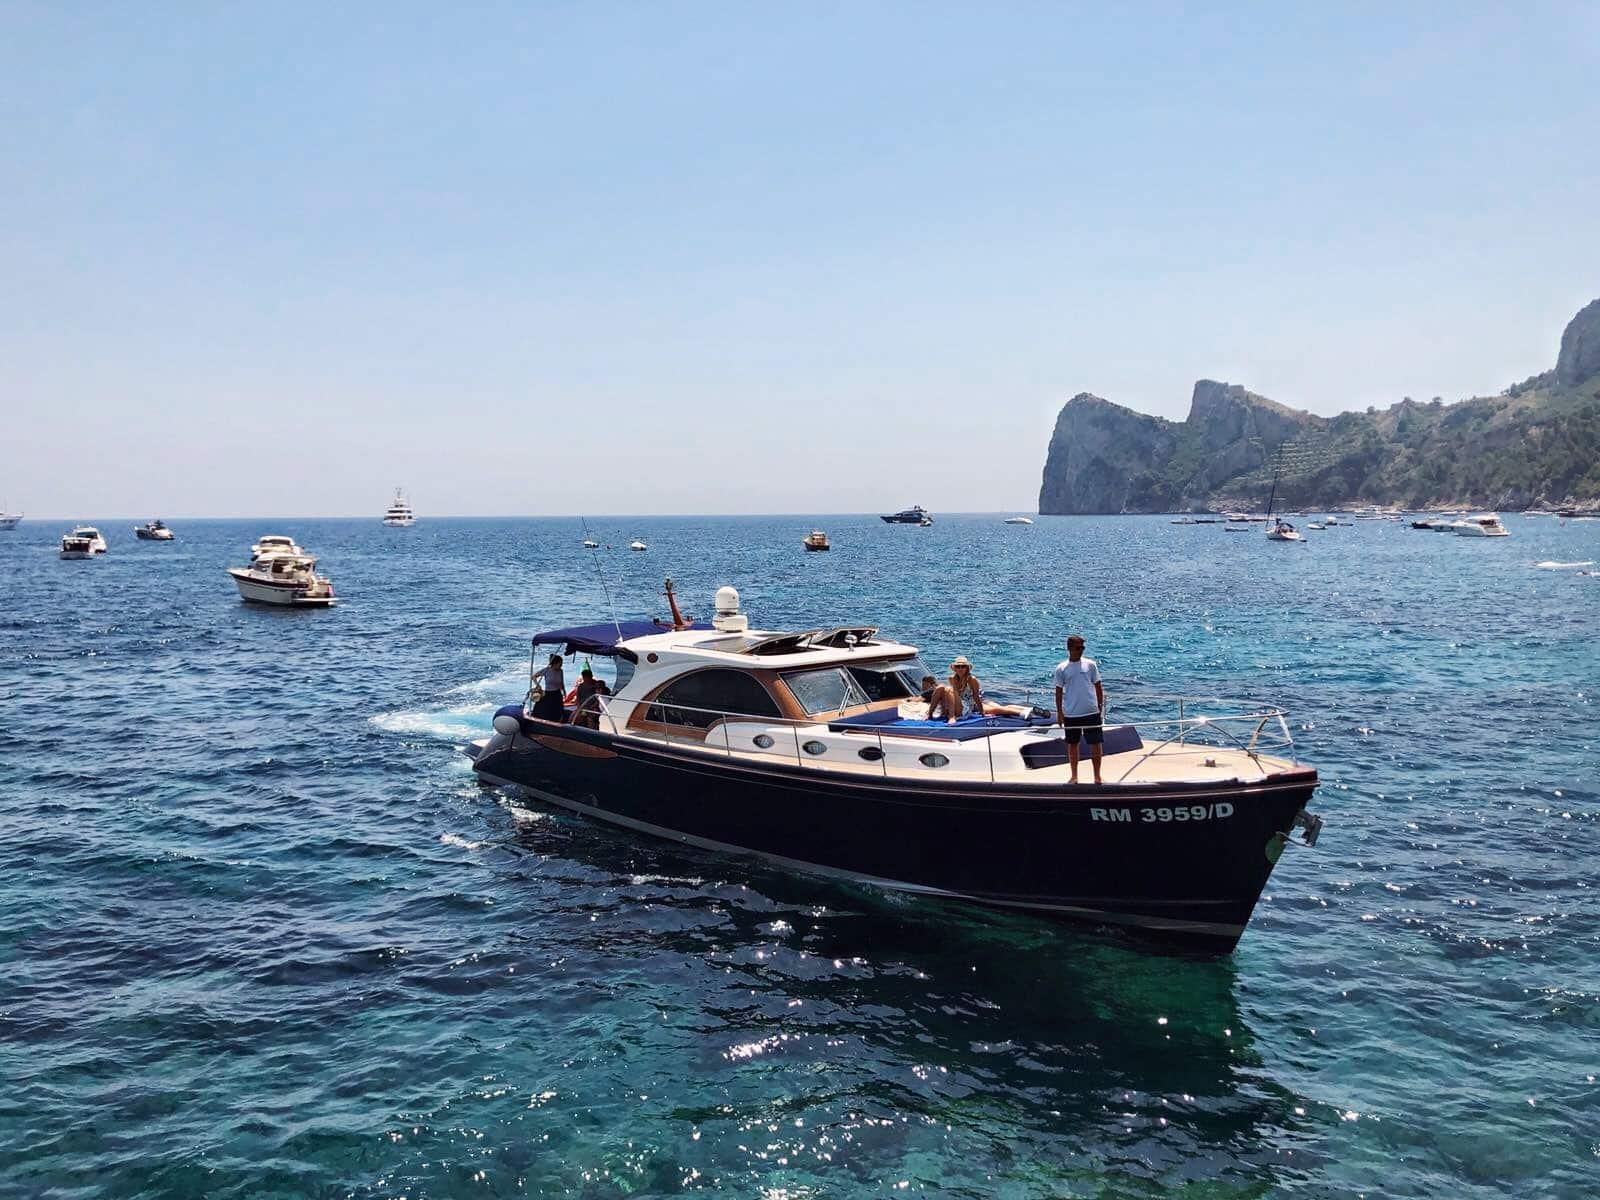 escursioni alle isole di capri yacht lovely touch